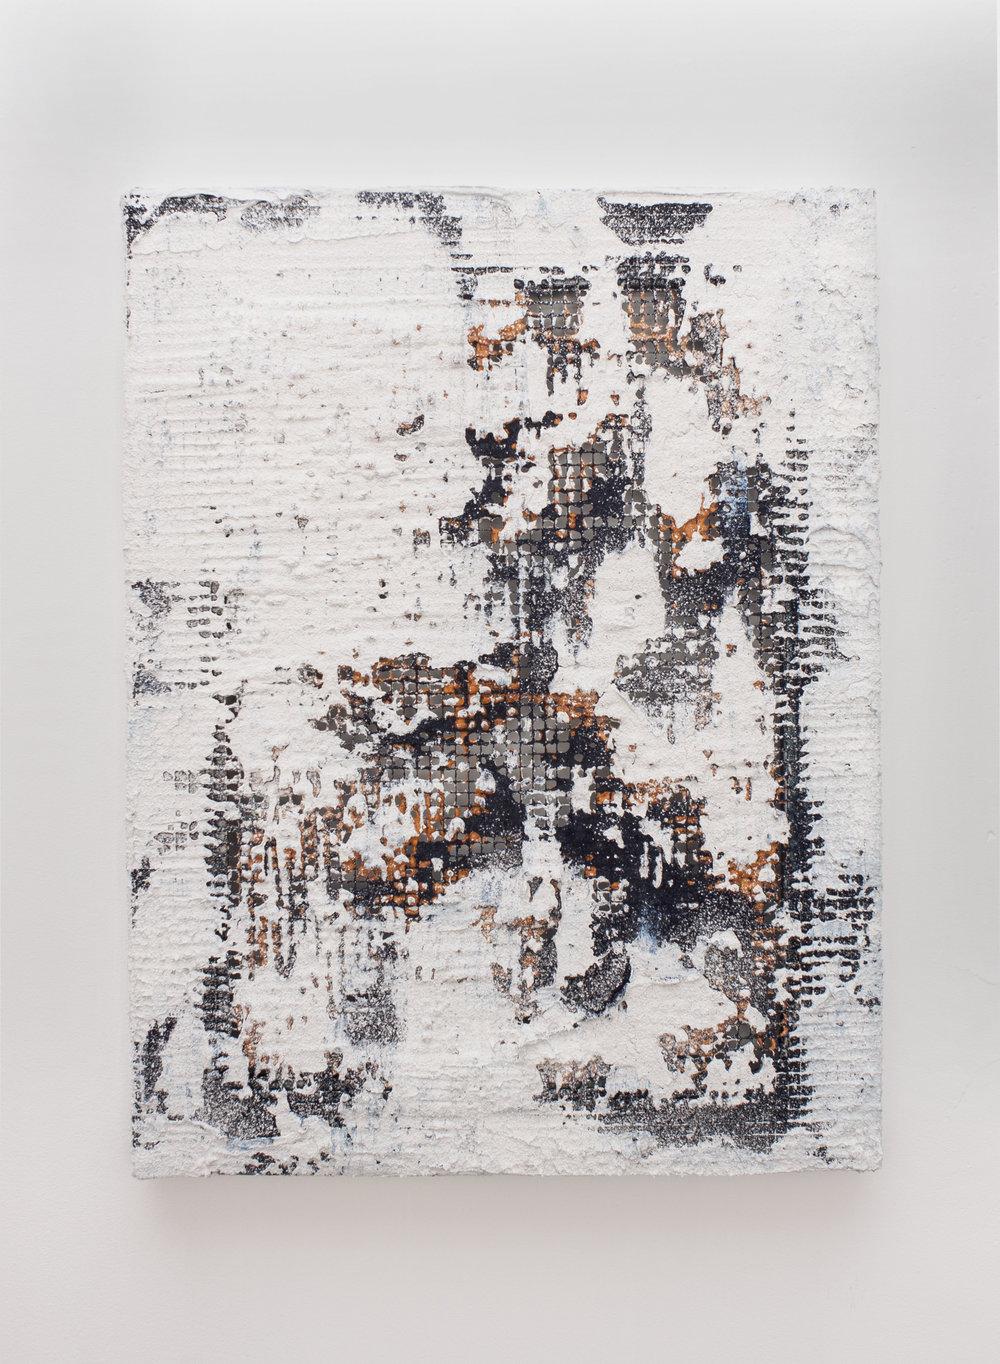 Untitled ,2018  Mixed media on metal mesh  50 x 38 cm